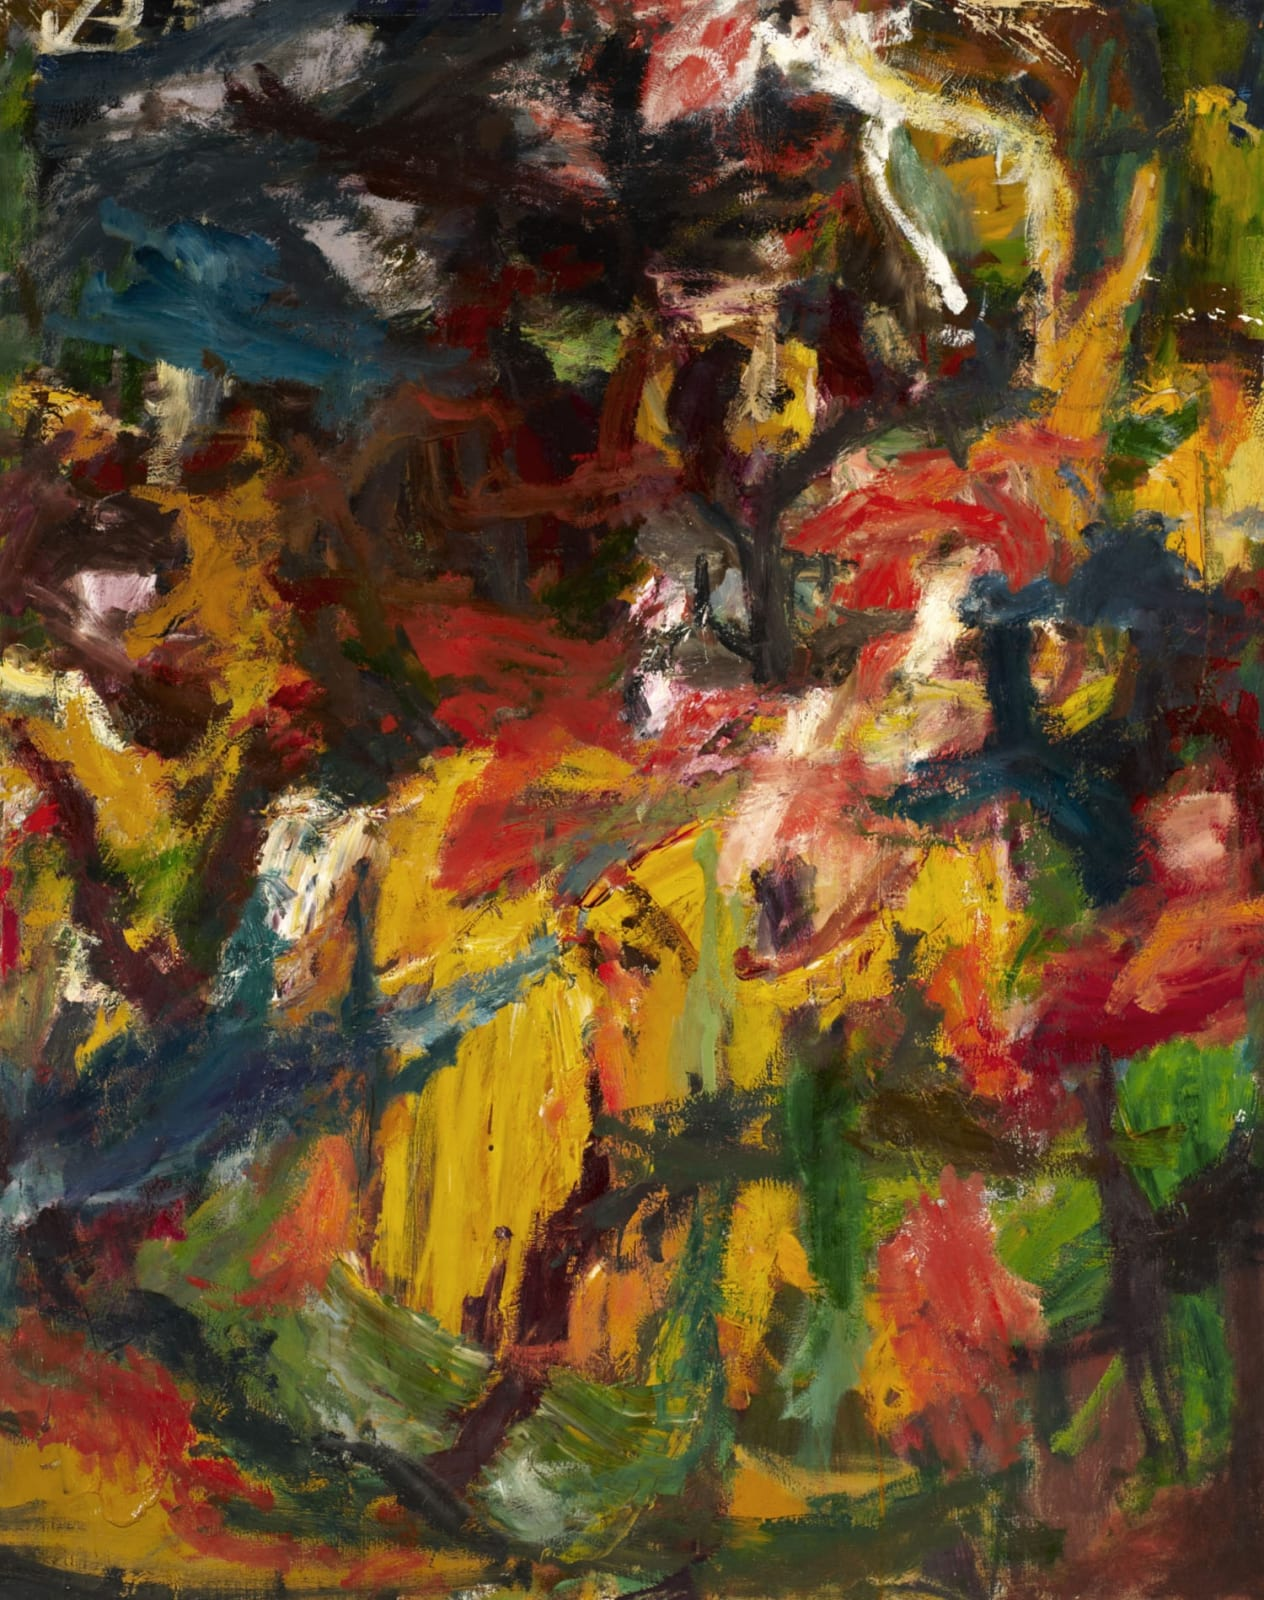 Erich Kahn (1904-1979) Composition n.d. Oil on canvas 126.5 x 101.5 cm Ben Uri Collection © Erich Kahn estate